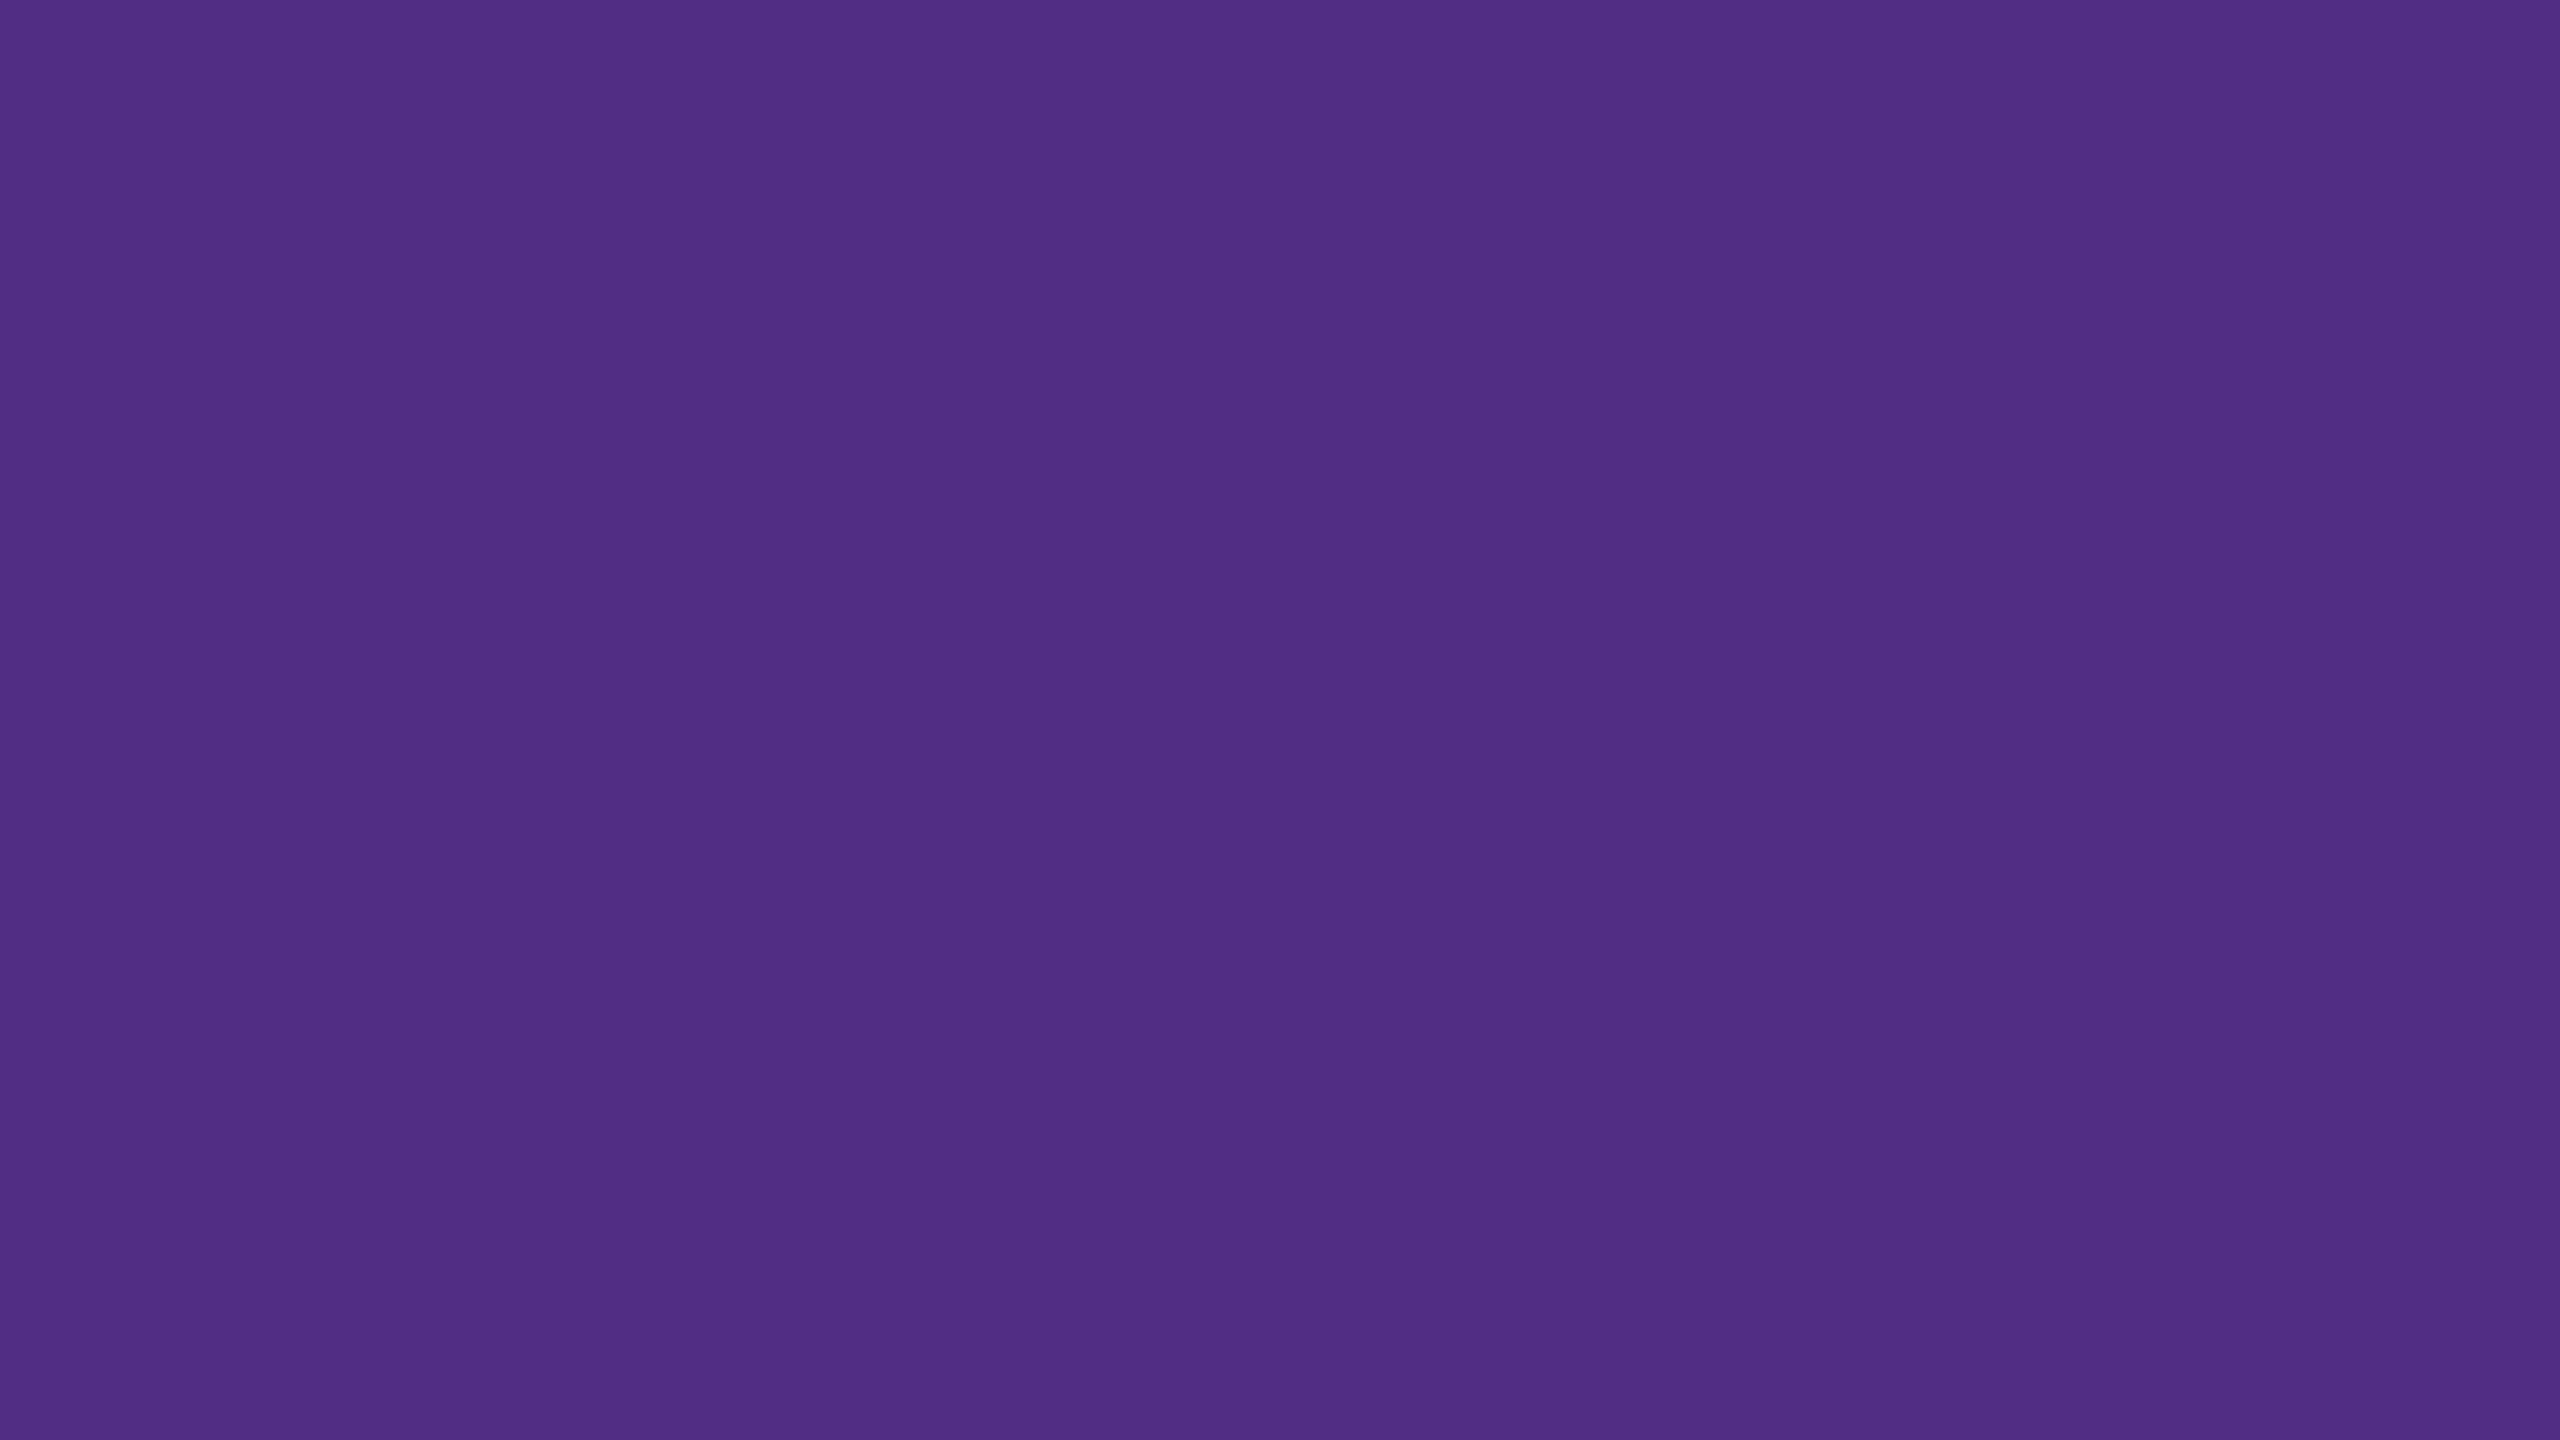 2560x1440 Regalia Solid Color Background